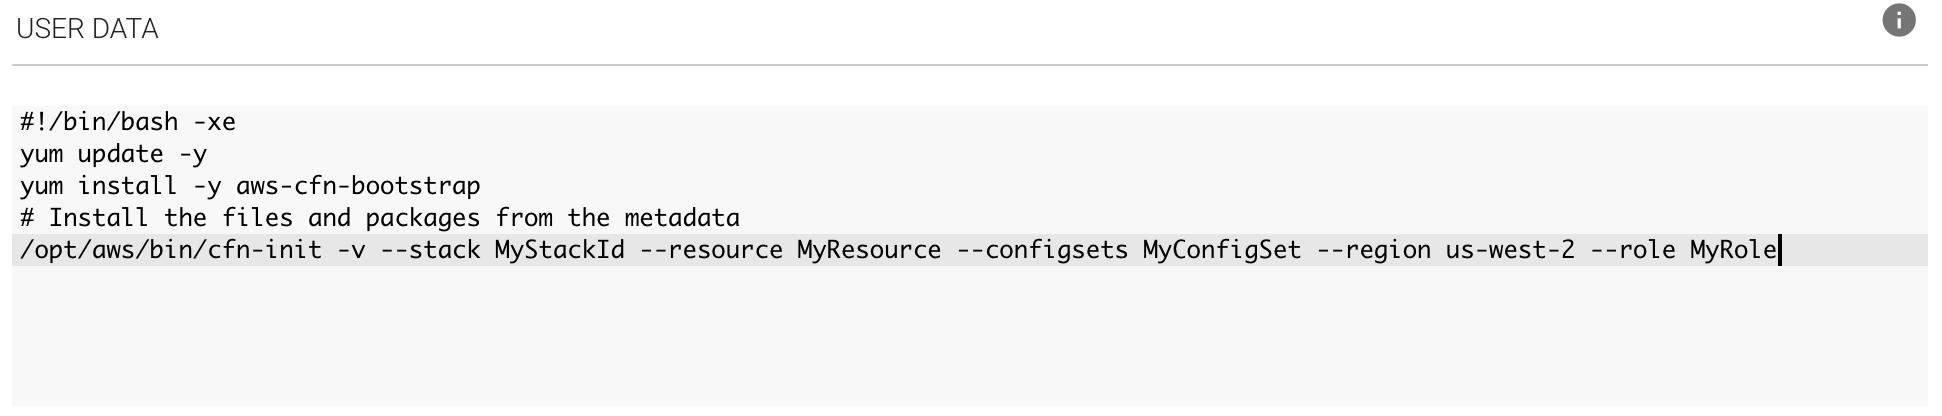 CFN Helper Scripts - Spotinst API